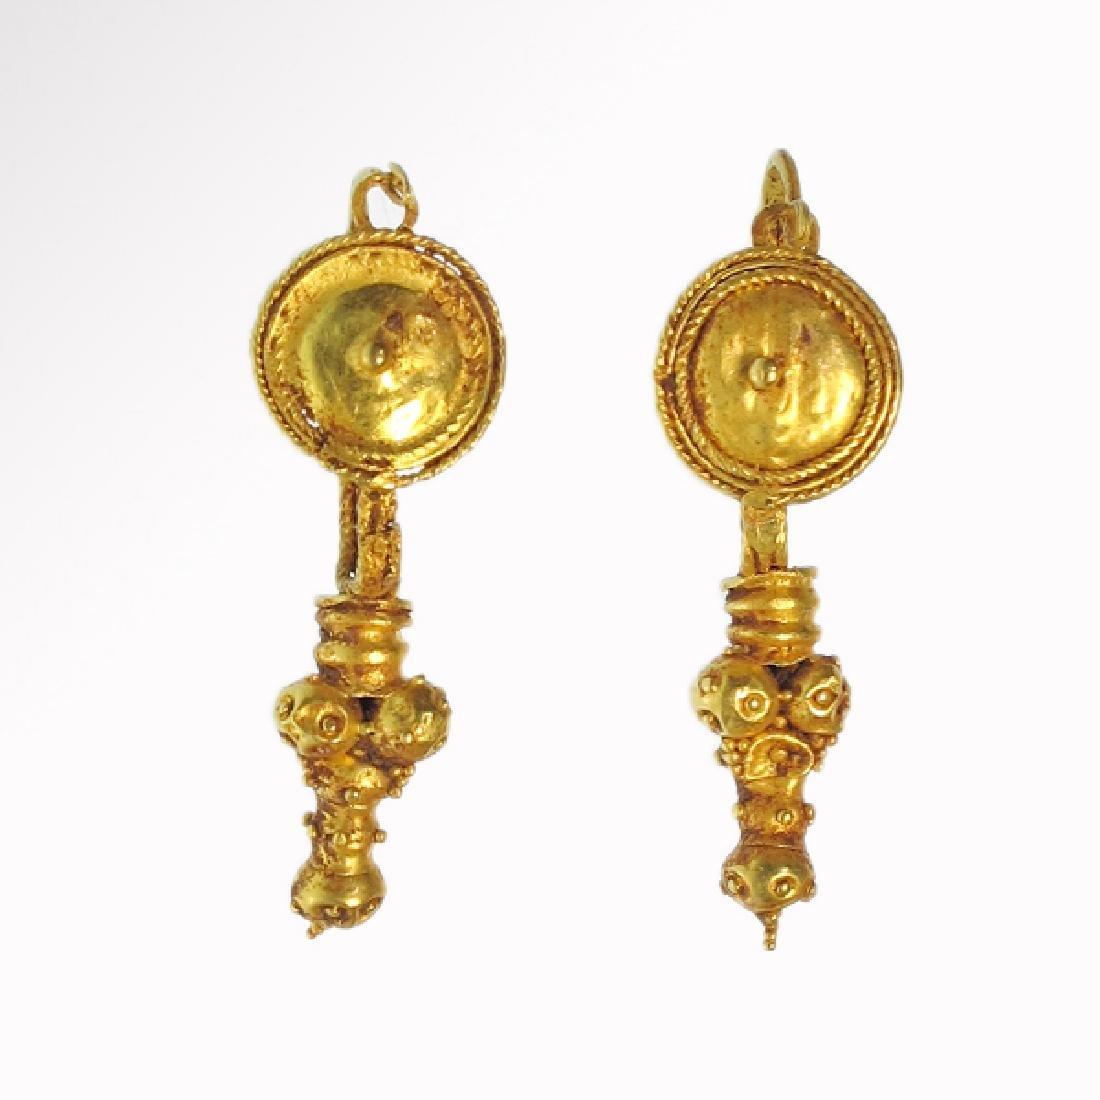 Roman Gold Earrings, 1st-2nd Century A.D.